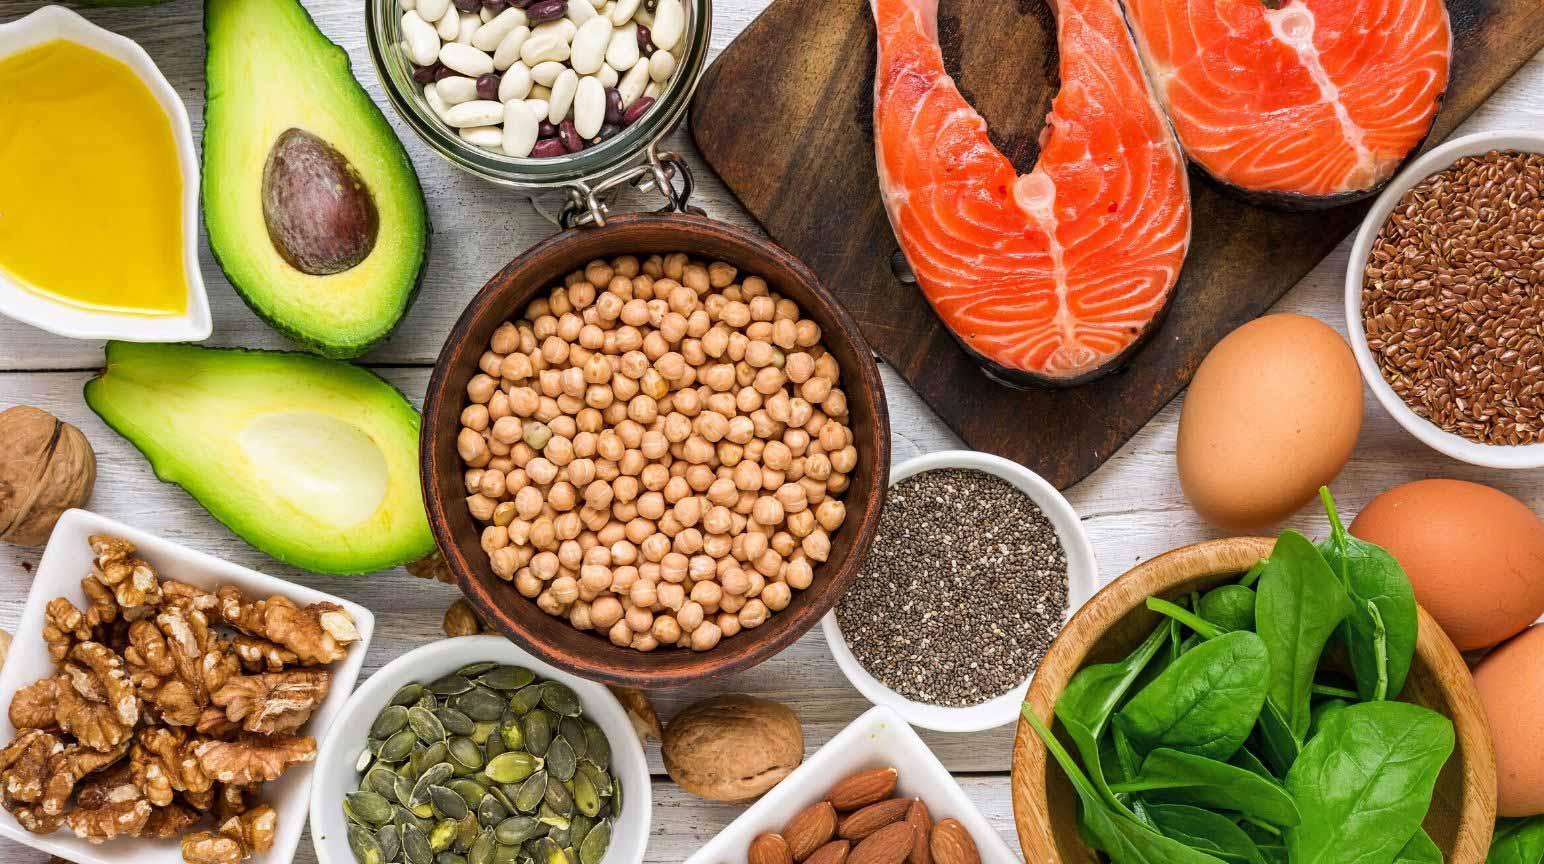 Benefits of Omega-3 Fatty Acids for Better Eyesight